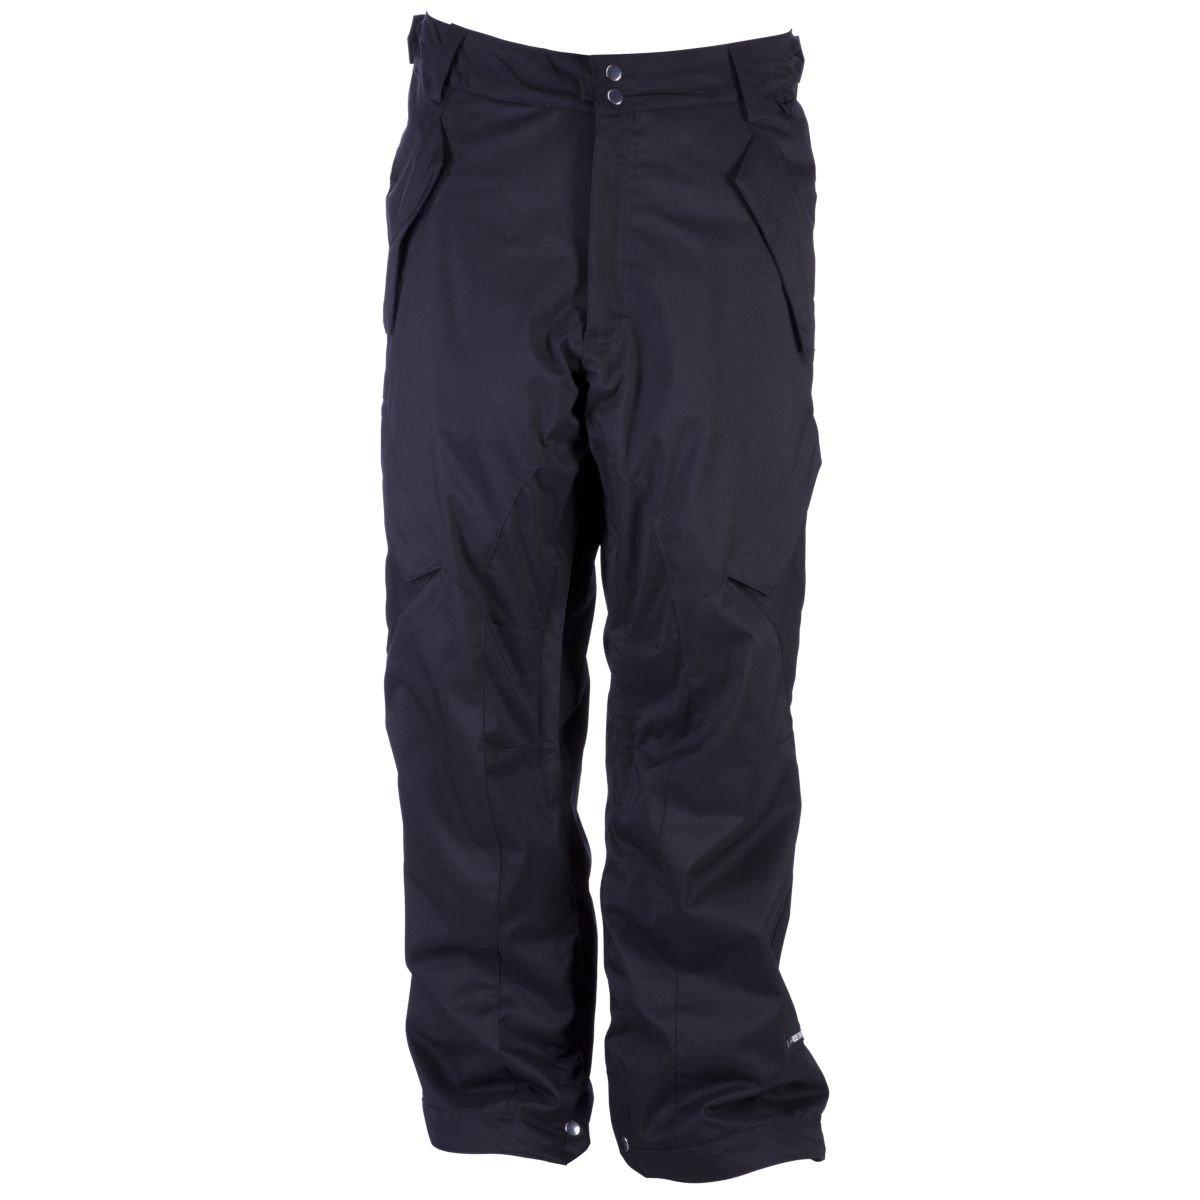 Herren Snowboard Hose Ride Phinney Pant kaufen